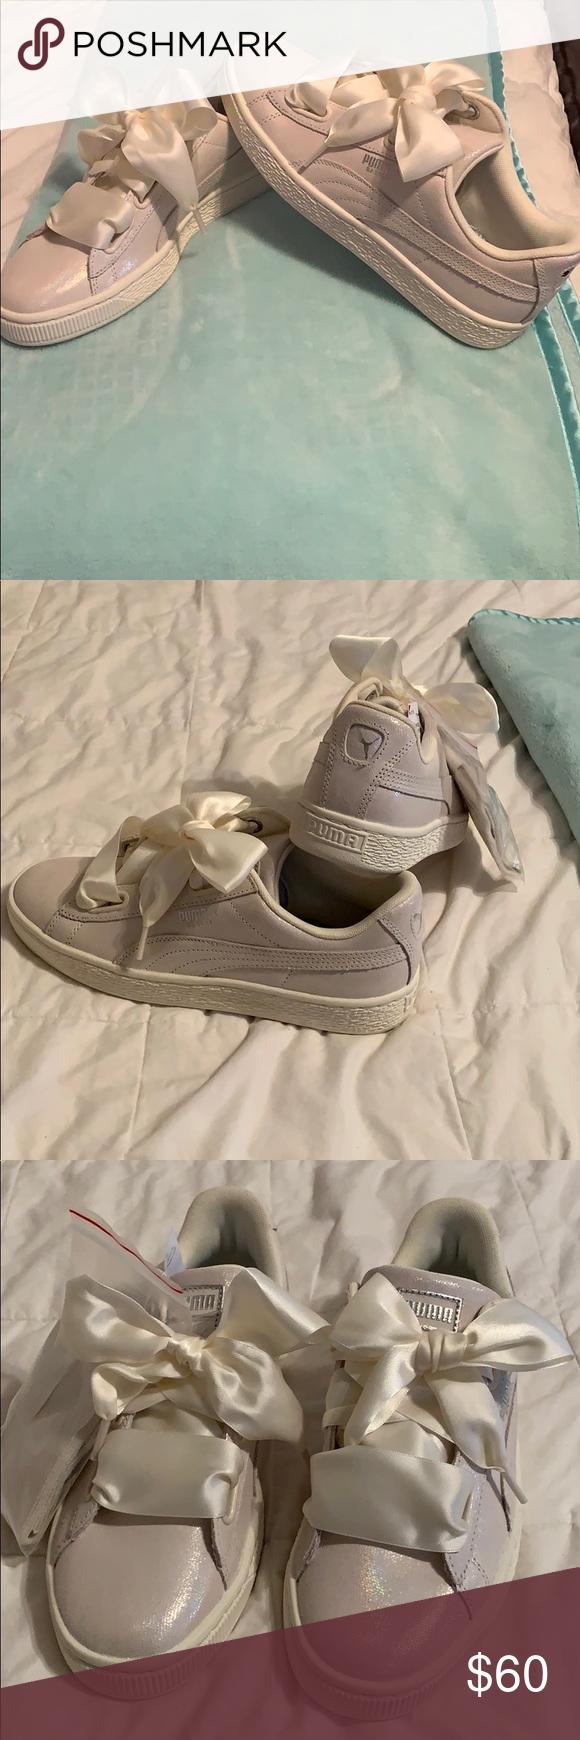 info for 77e99 f5e89 Puma Basket Hearts Sneakers Rihanna Brand New, out of box ...